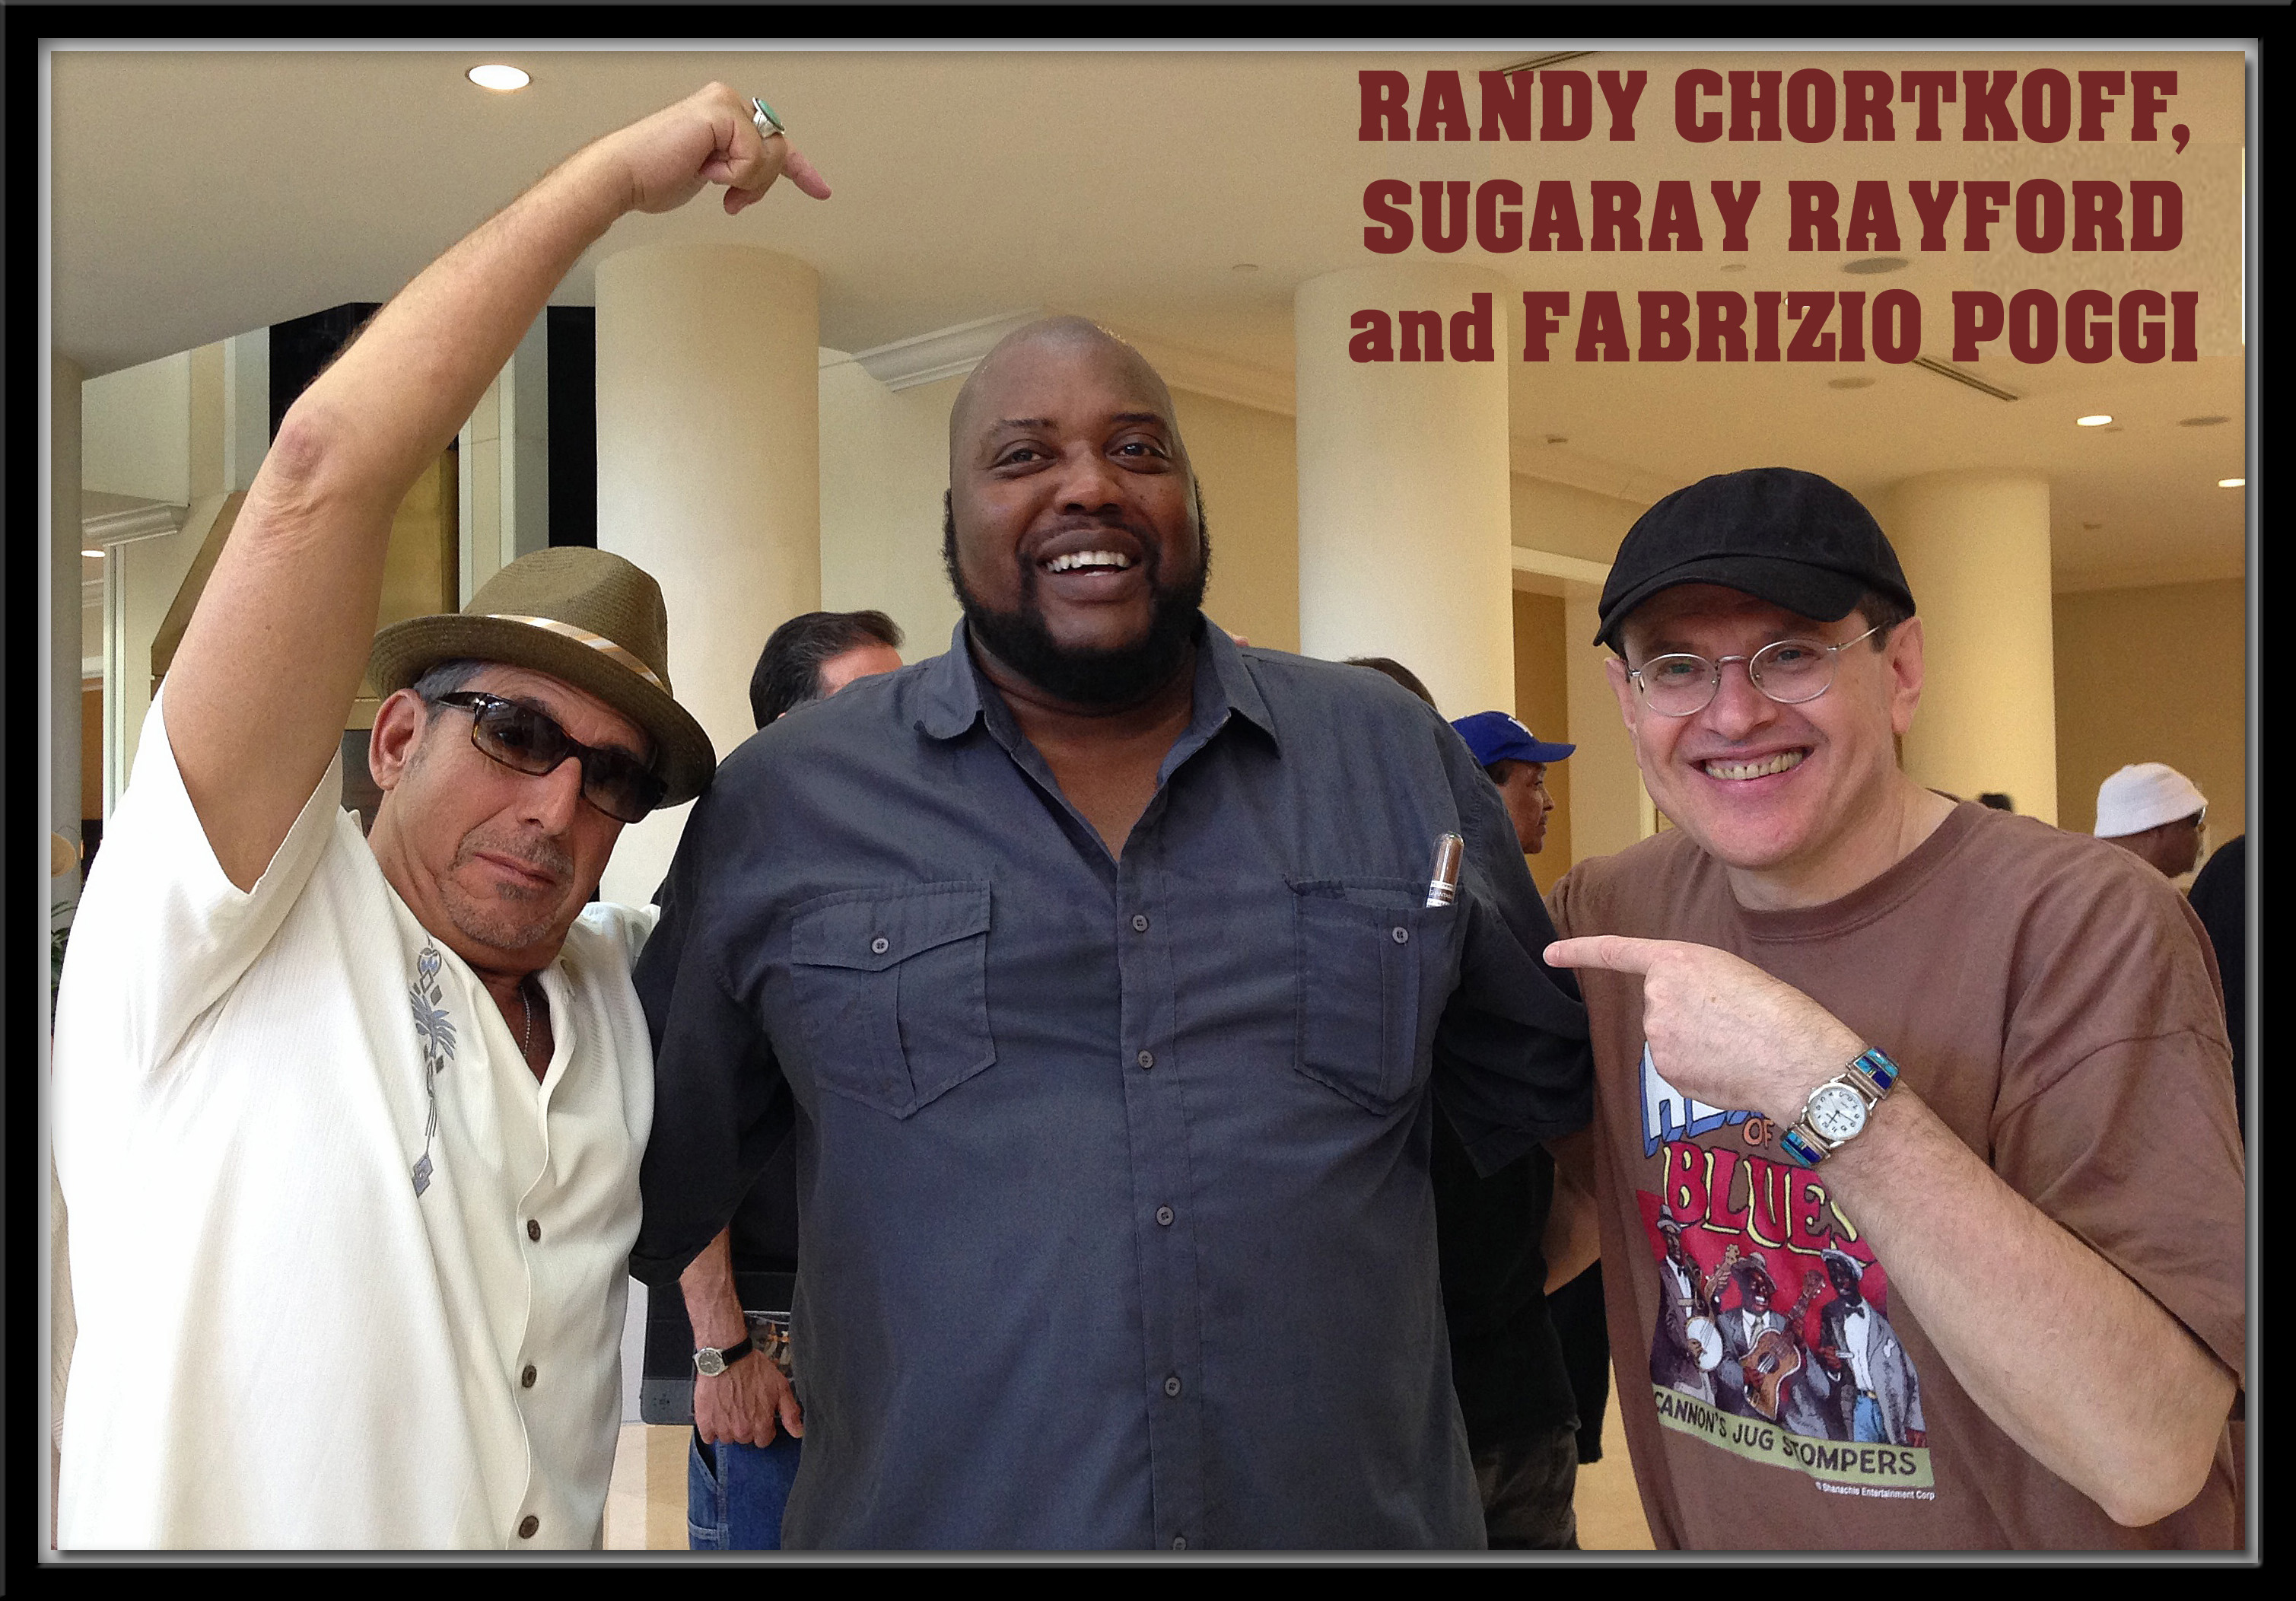 RANDY CHORTKOFF, SUGARAY RAYFORD & FABRIZIO POGGI